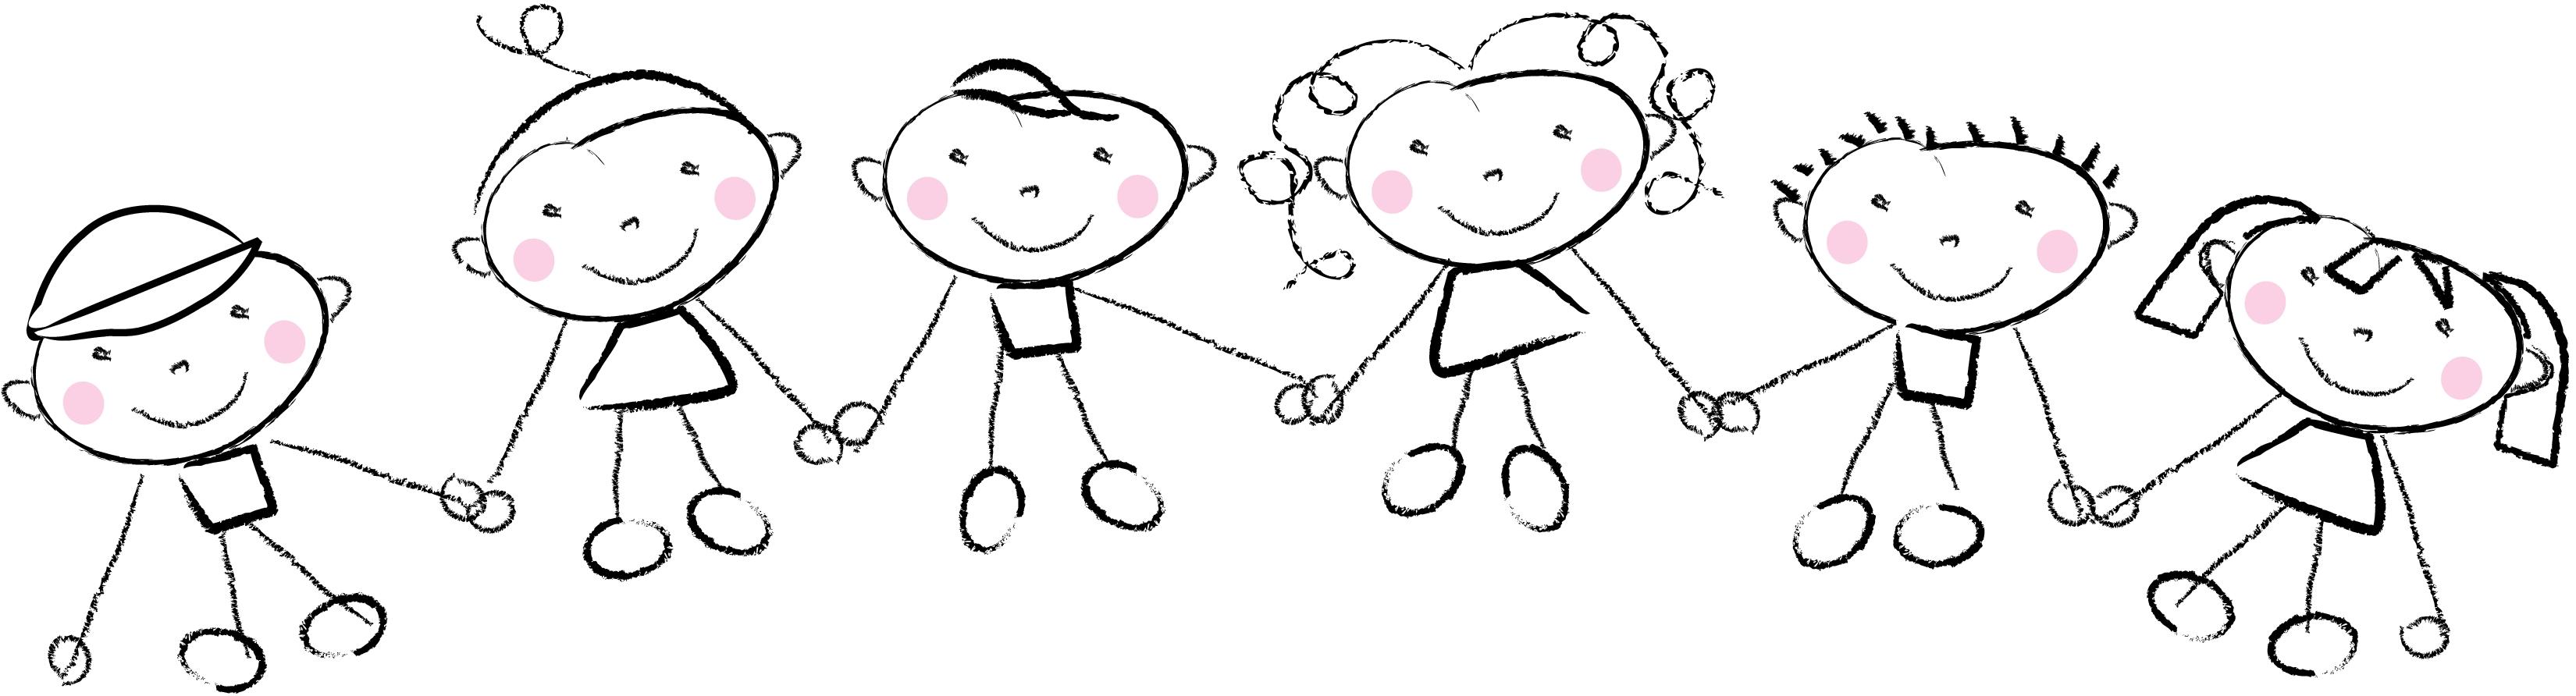 Children Holding Hands - Cliparts.co (3300 x 892 Pixel)